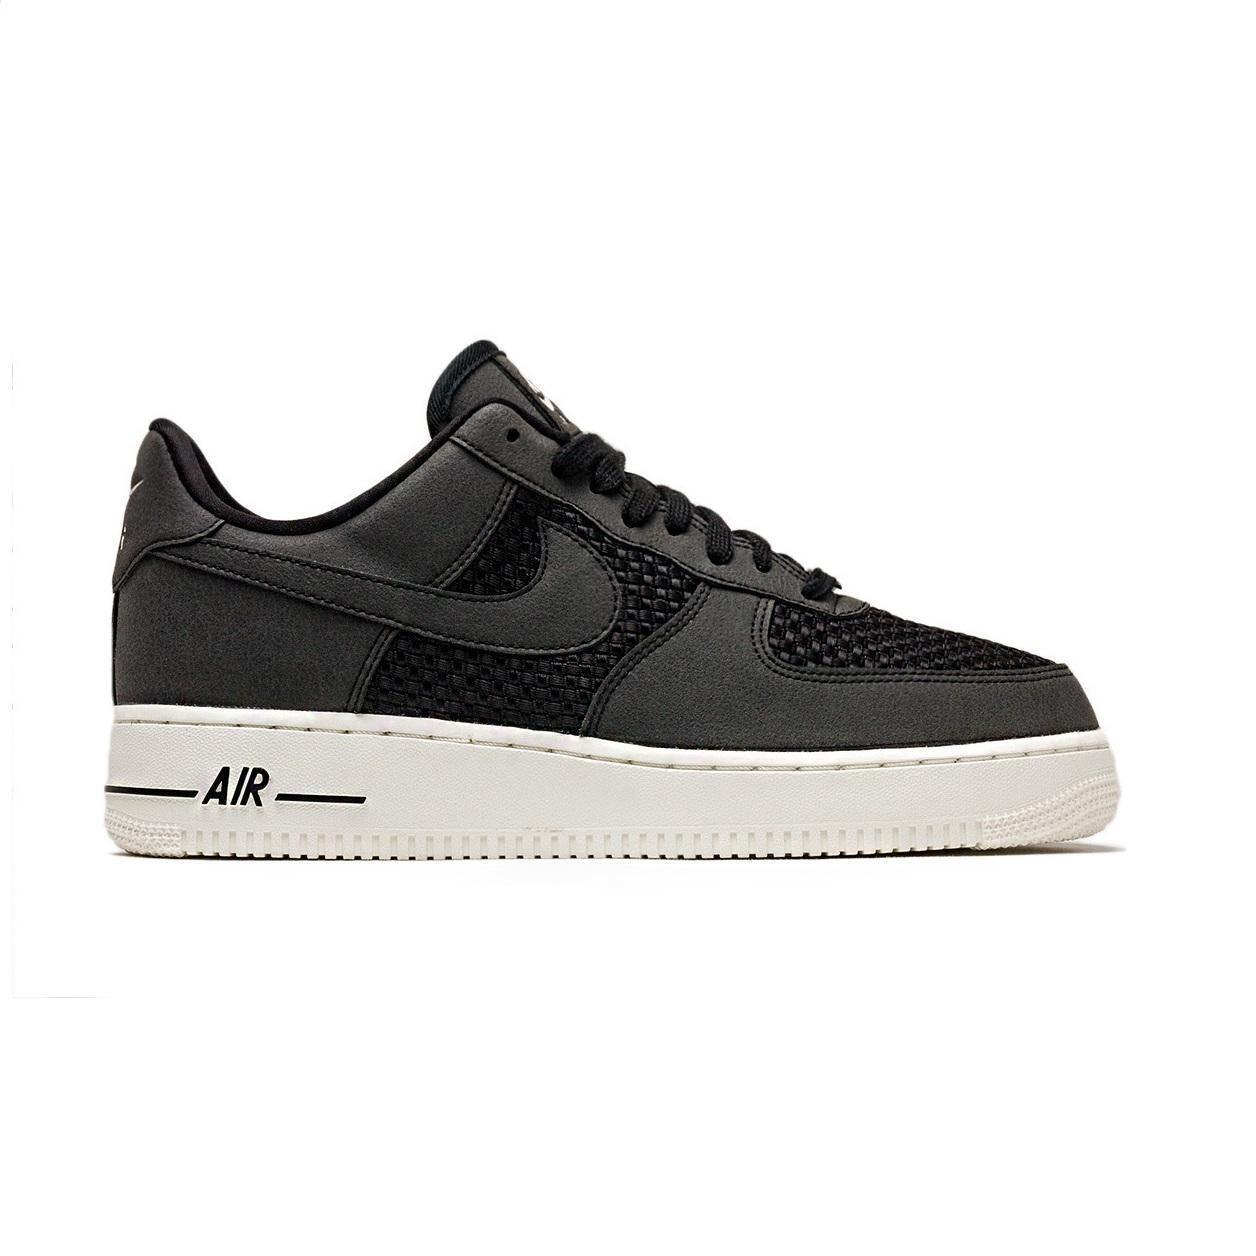 Herren Nike Air Force 1 Lo Schwarze Turnschuhe AQ8624 001